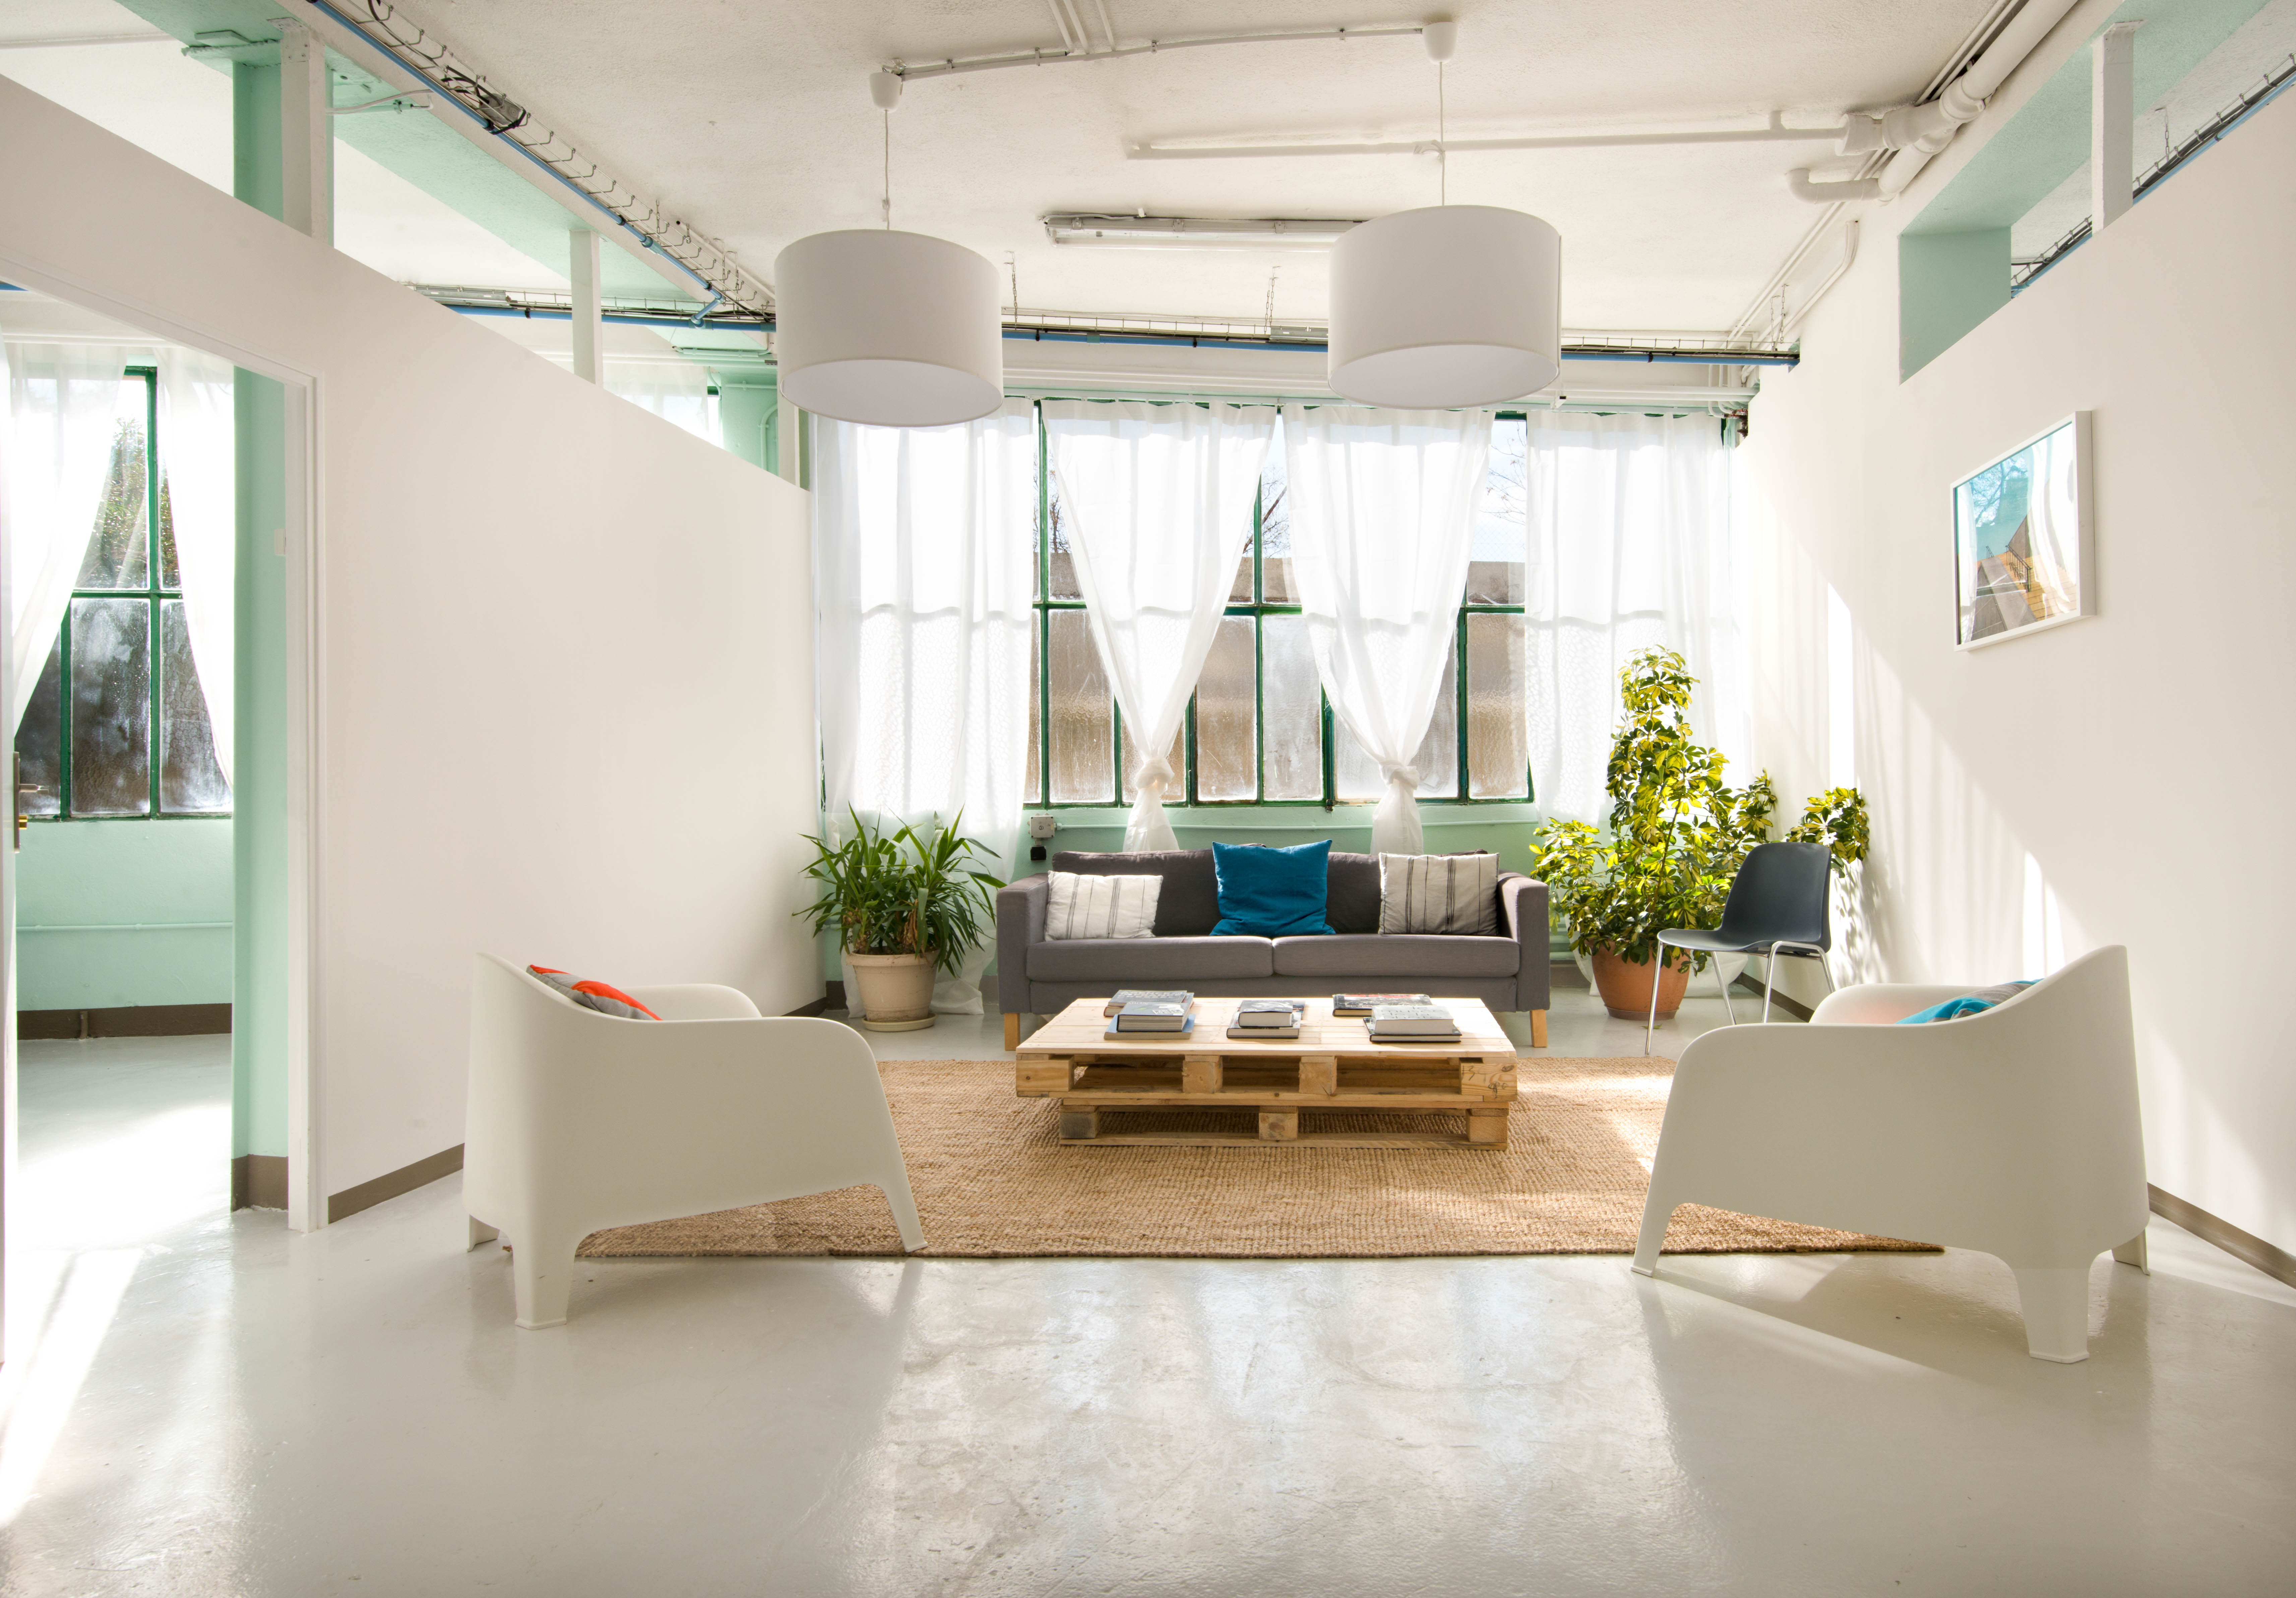 tarif location salle marseille pas cher. Black Bedroom Furniture Sets. Home Design Ideas